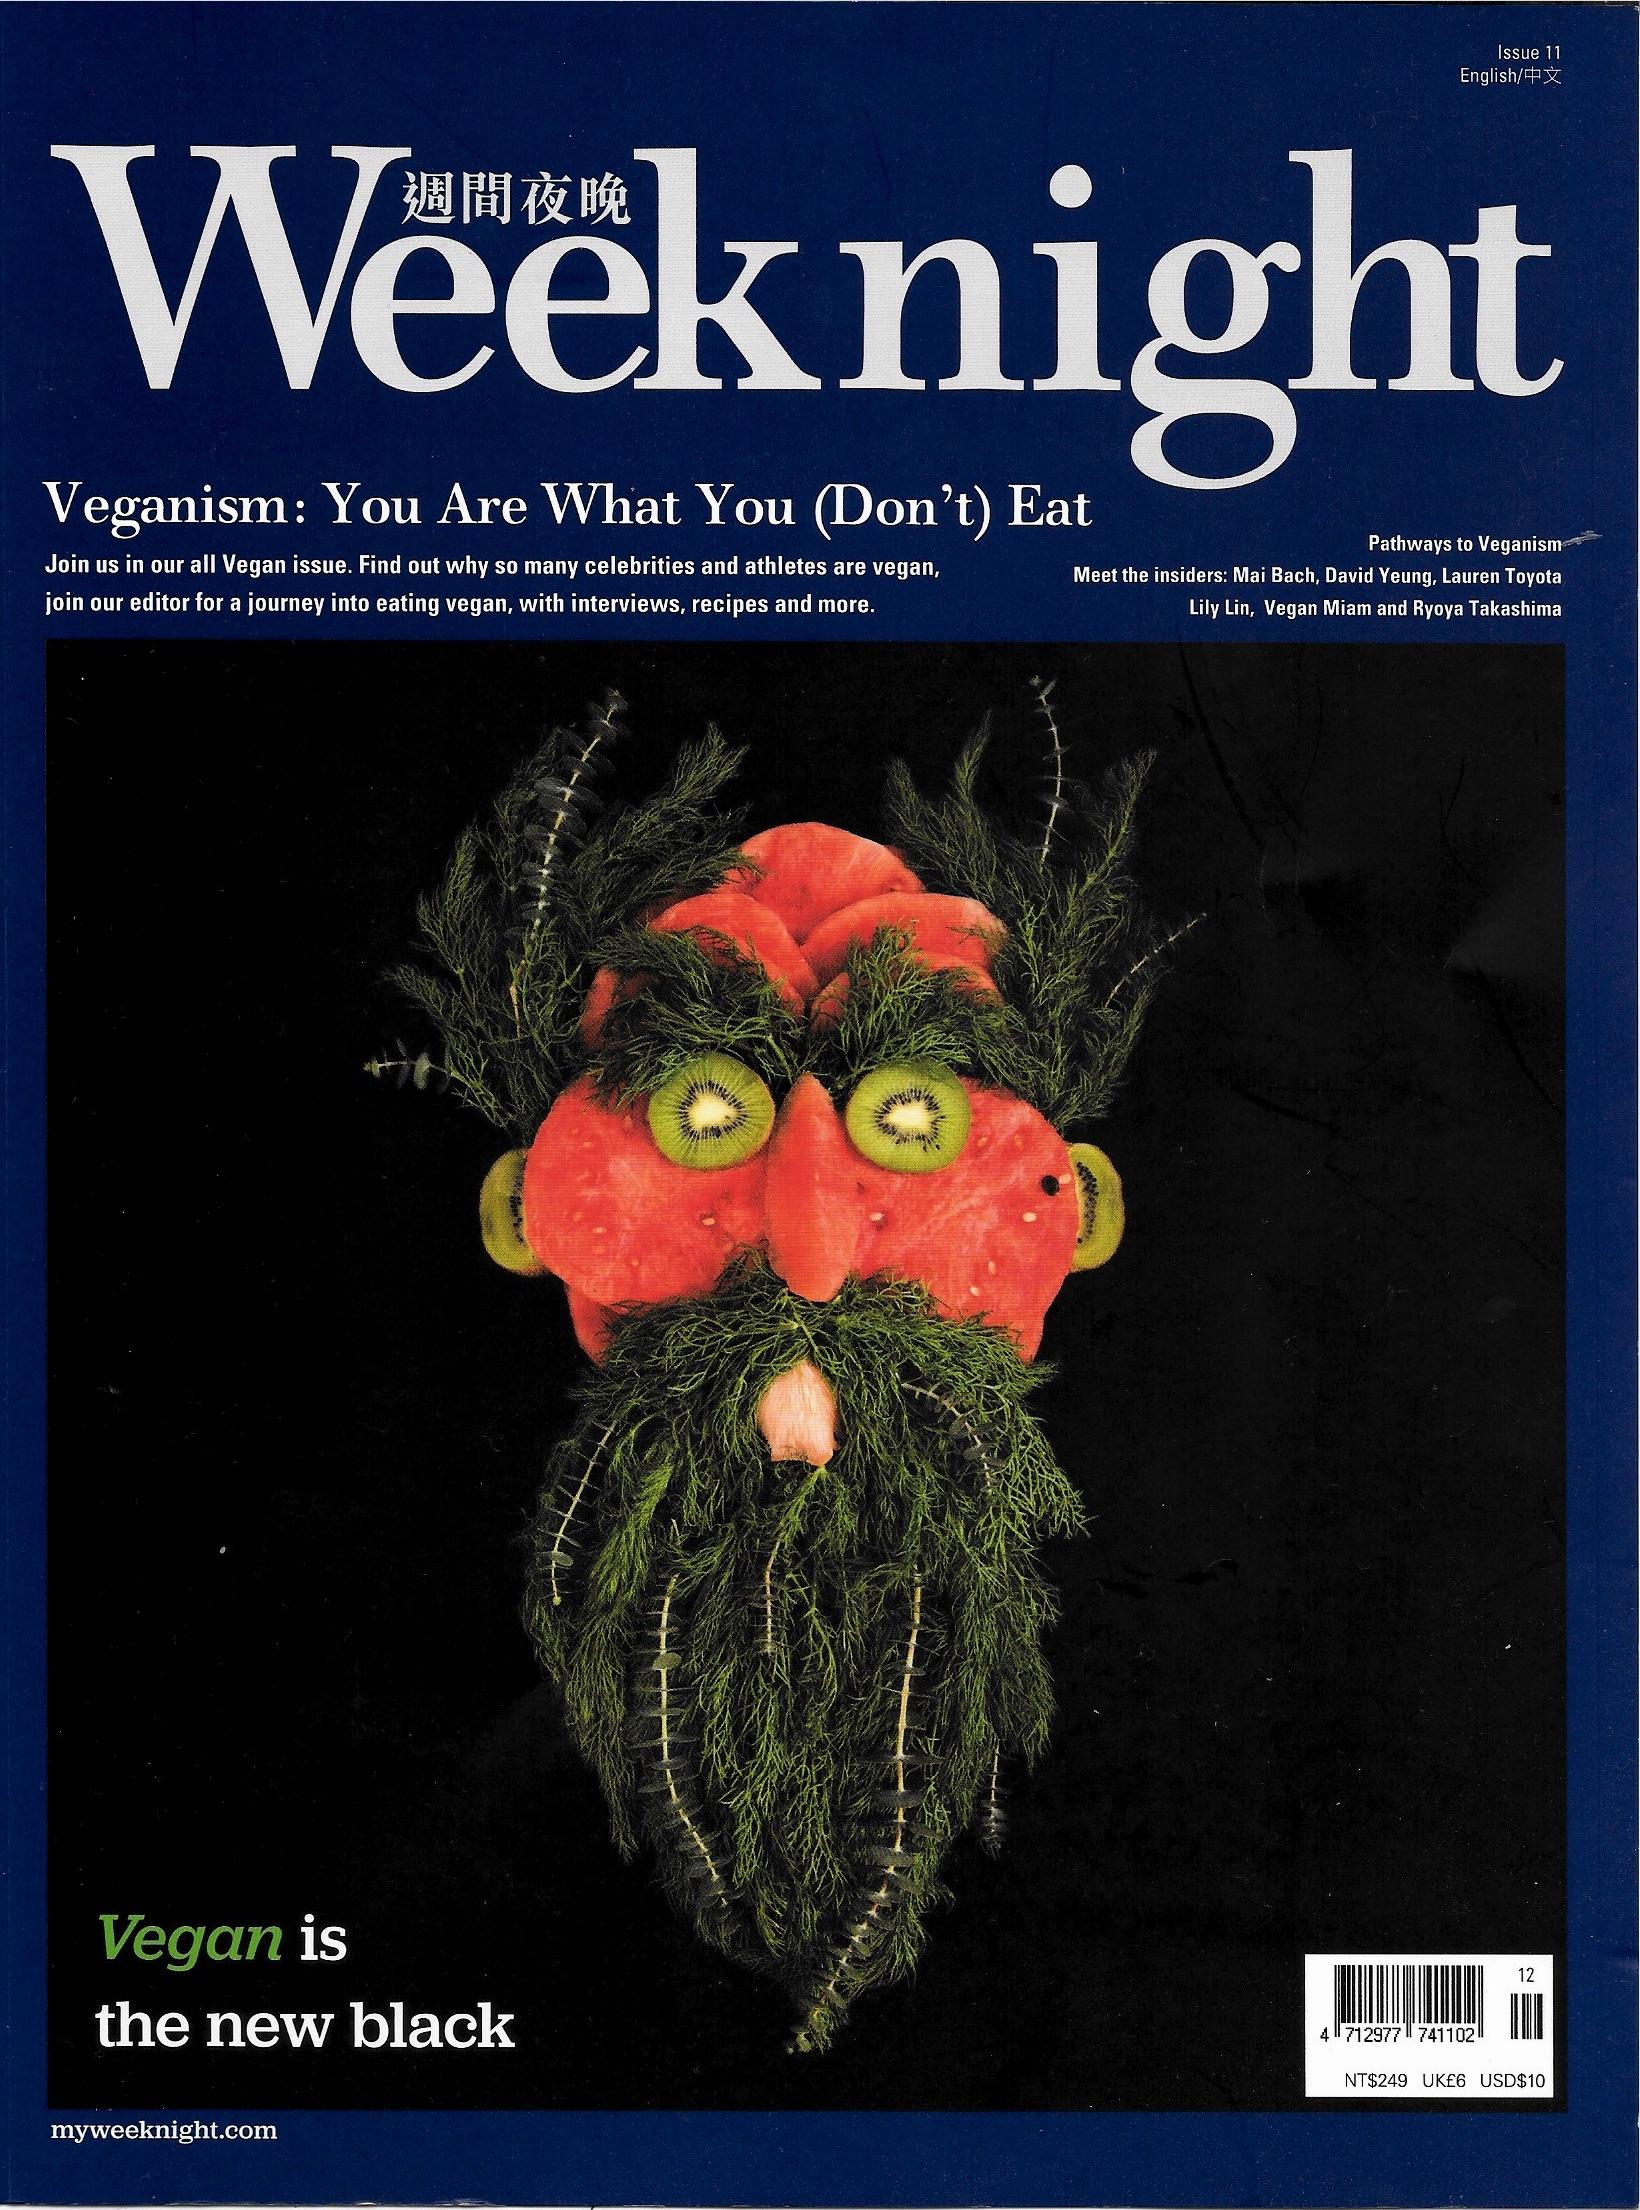 Weeknight cover.jpg